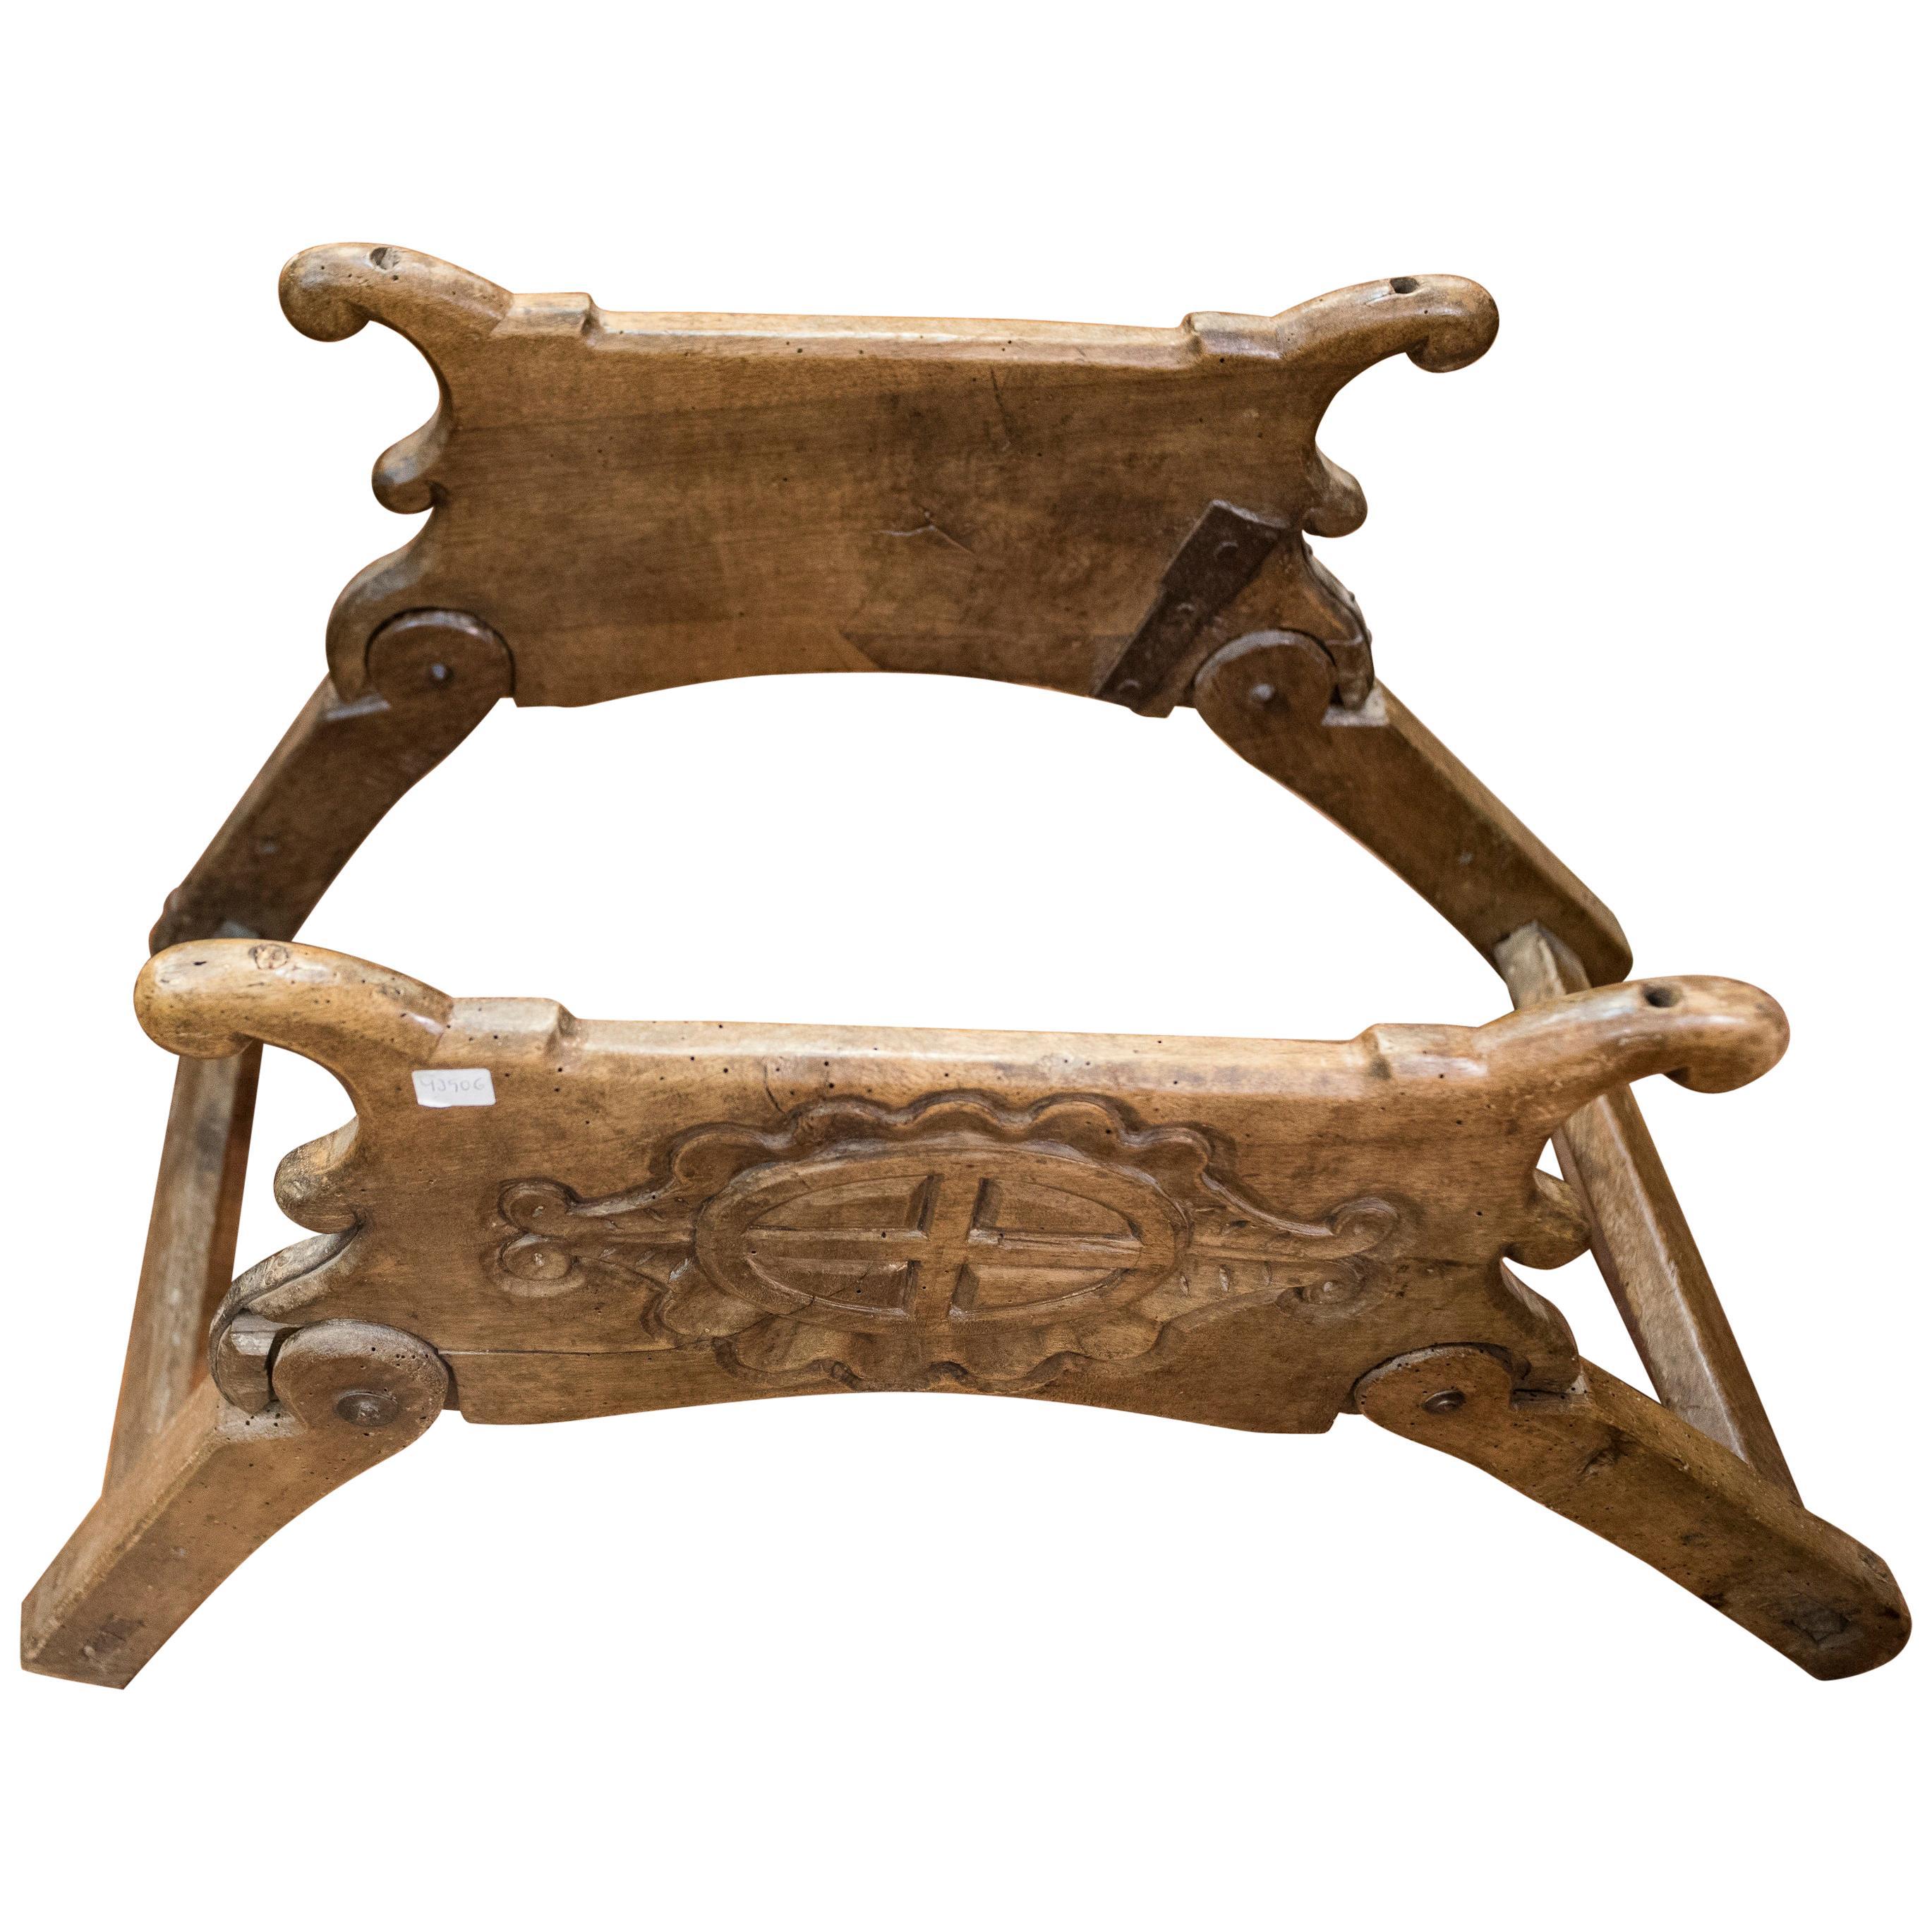 16th Century Spanish Walnut and Wrought Iron Dromedary Saddle